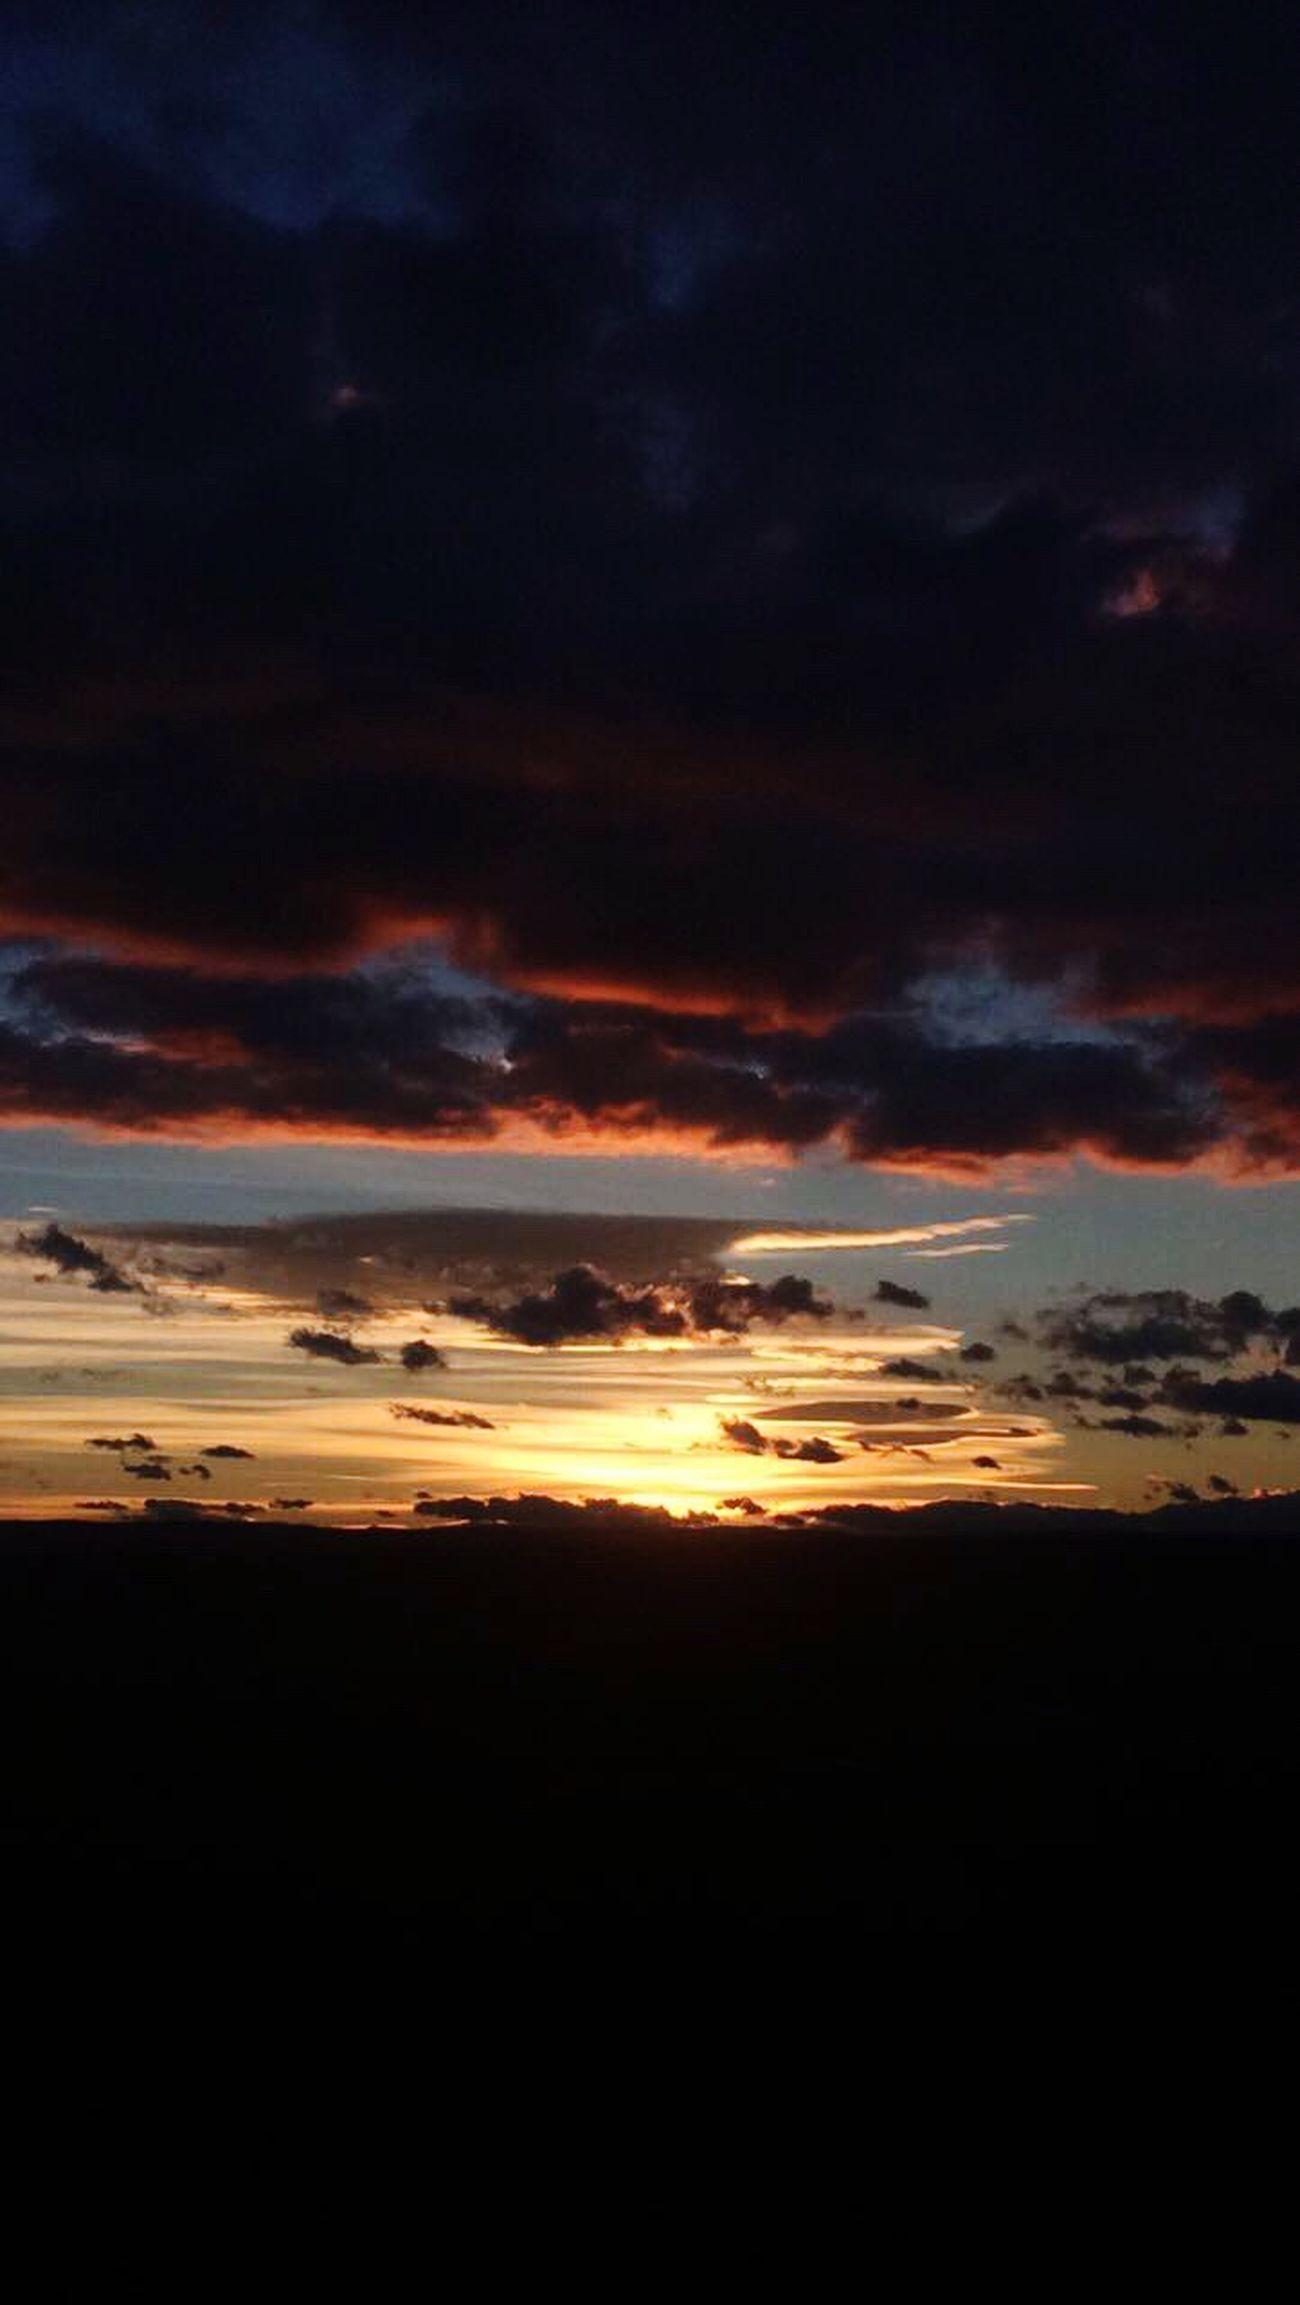 Sun Sunset Originalpicture Cloud - Sky Beauty In Nature Sky Nature Dramatic Sky No People Day Nature Original Photo Original Photography Clouds